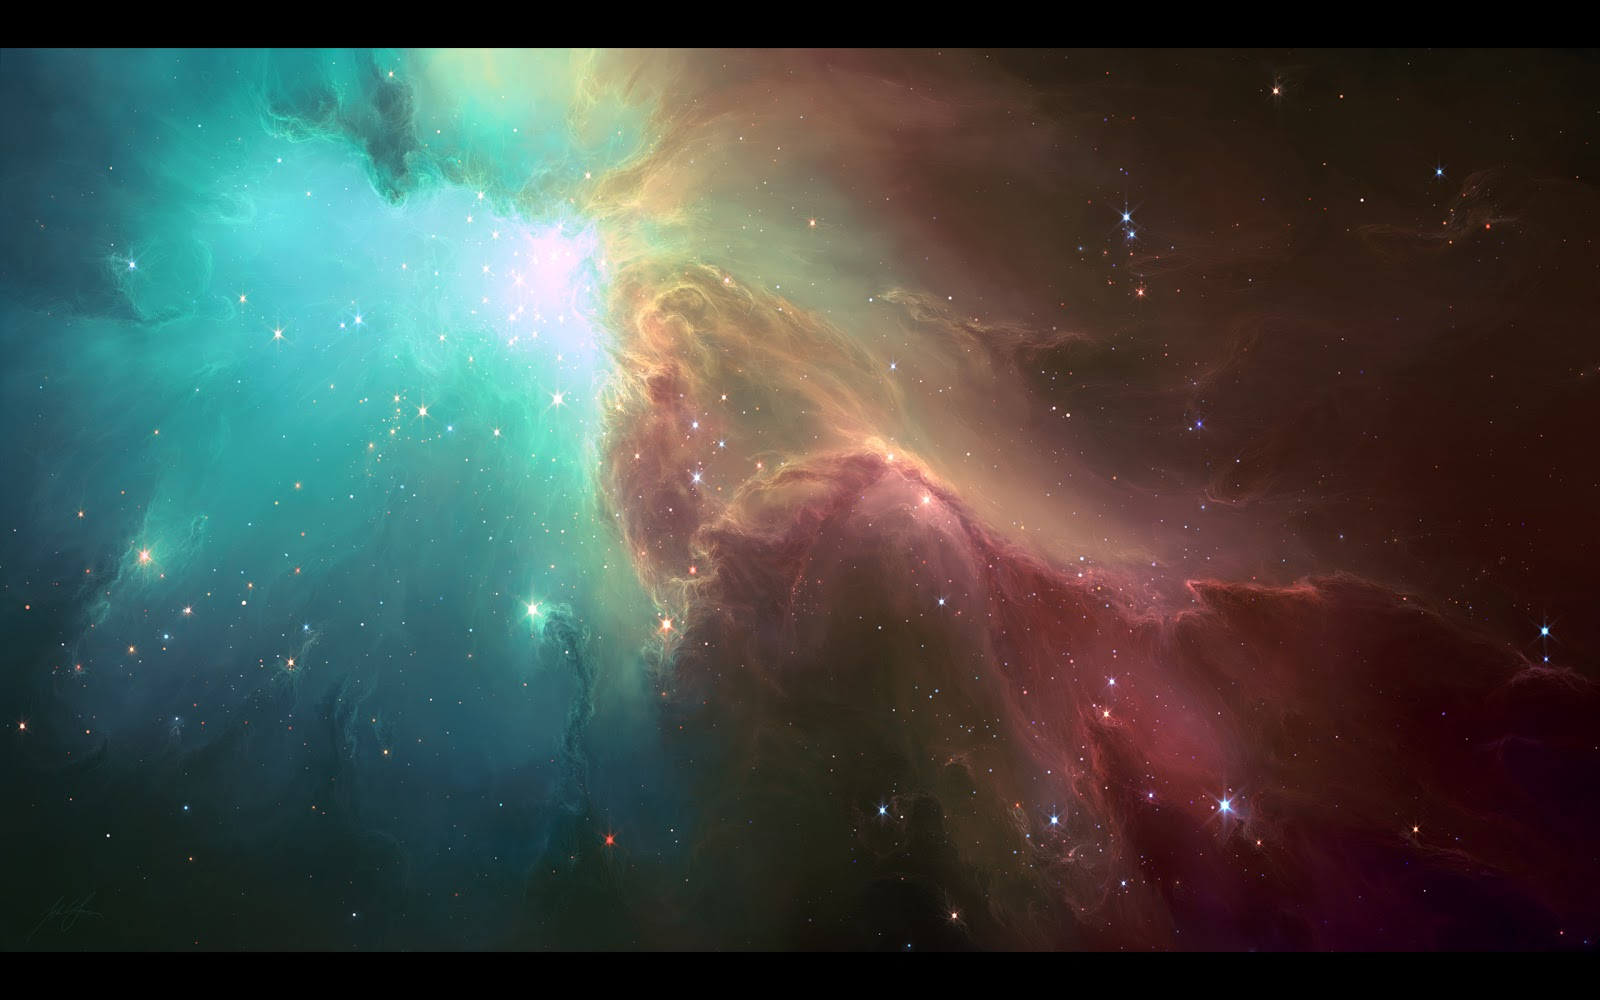 http://2.bp.blogspot.com/-jl66afLve8c/UOCXGTjKwZI/AAAAAAAAA84/ztU8uojKEKo/s1600/nebulae_sky-wide.jpg